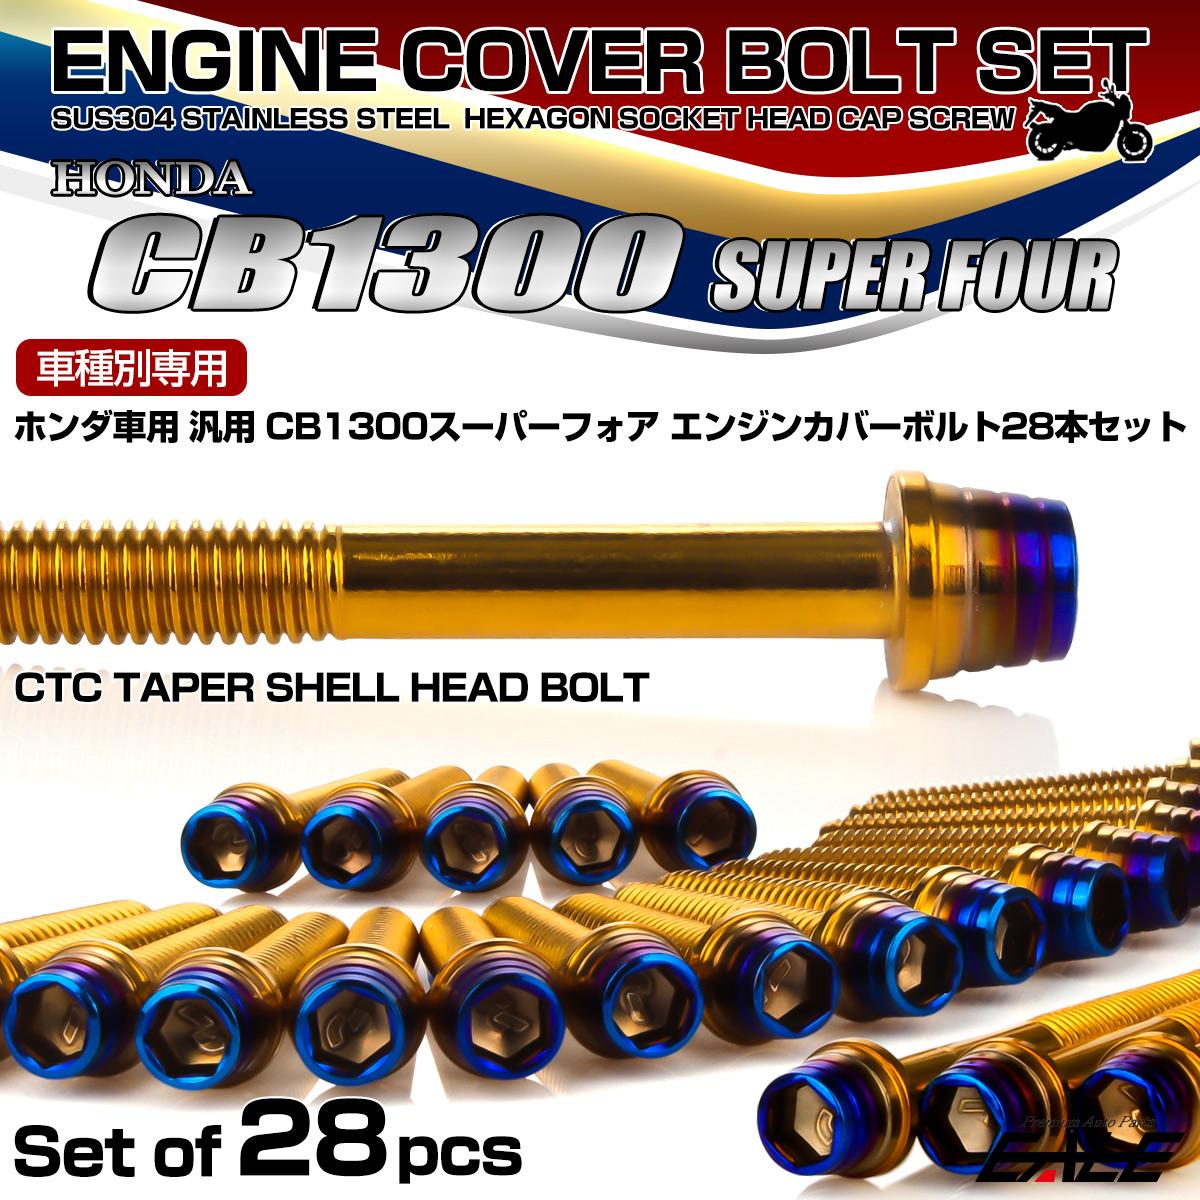 CB1300SF エンジンカバーボルトセット 28本 ホンダ車用 スーパーフォア CTCテーパーシェルヘッド ゴールド&焼きチタン TB6287